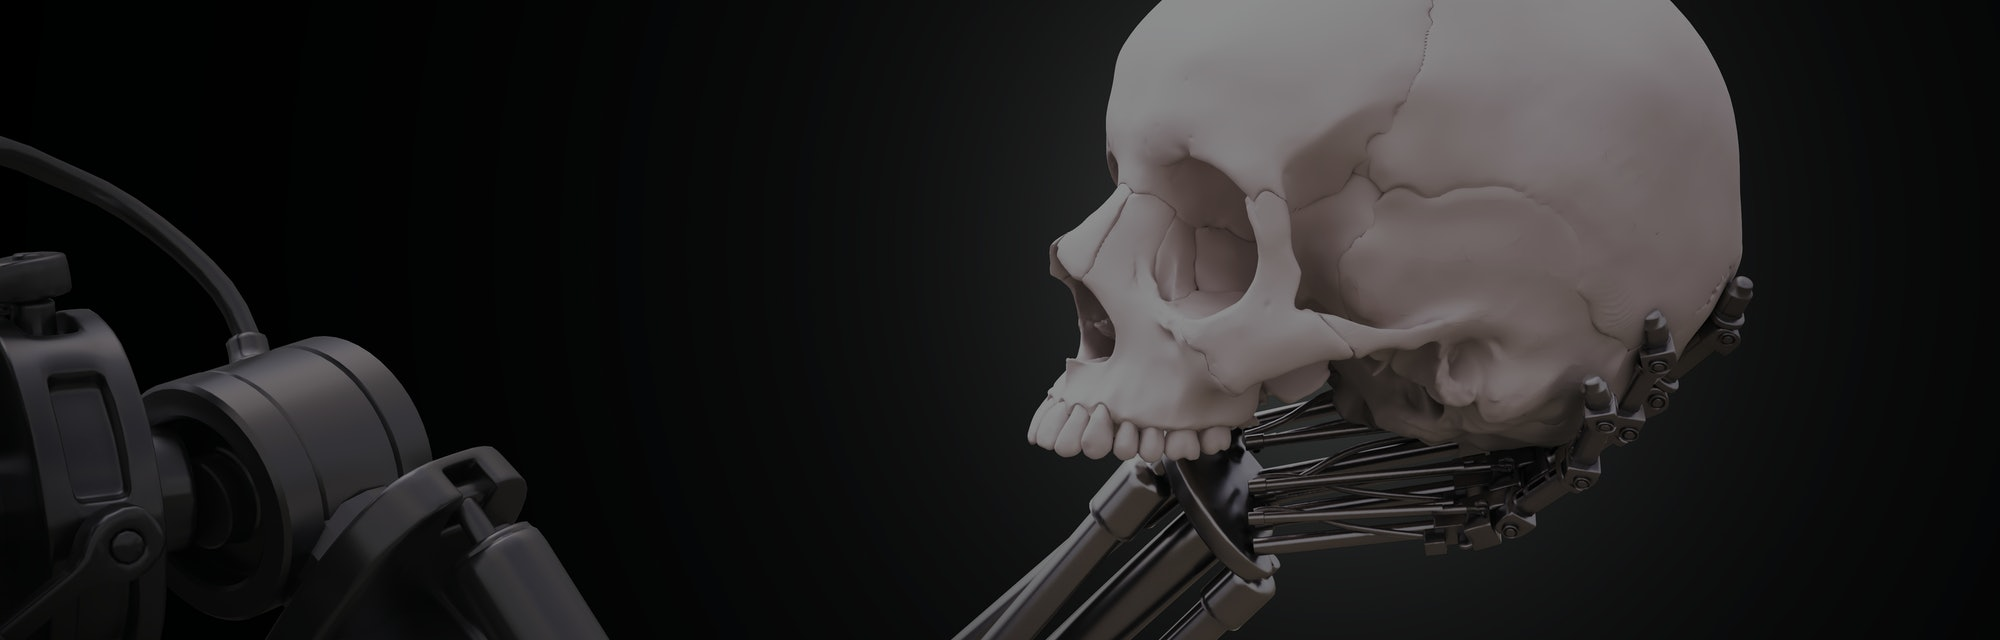 Robot arm holding a human skull